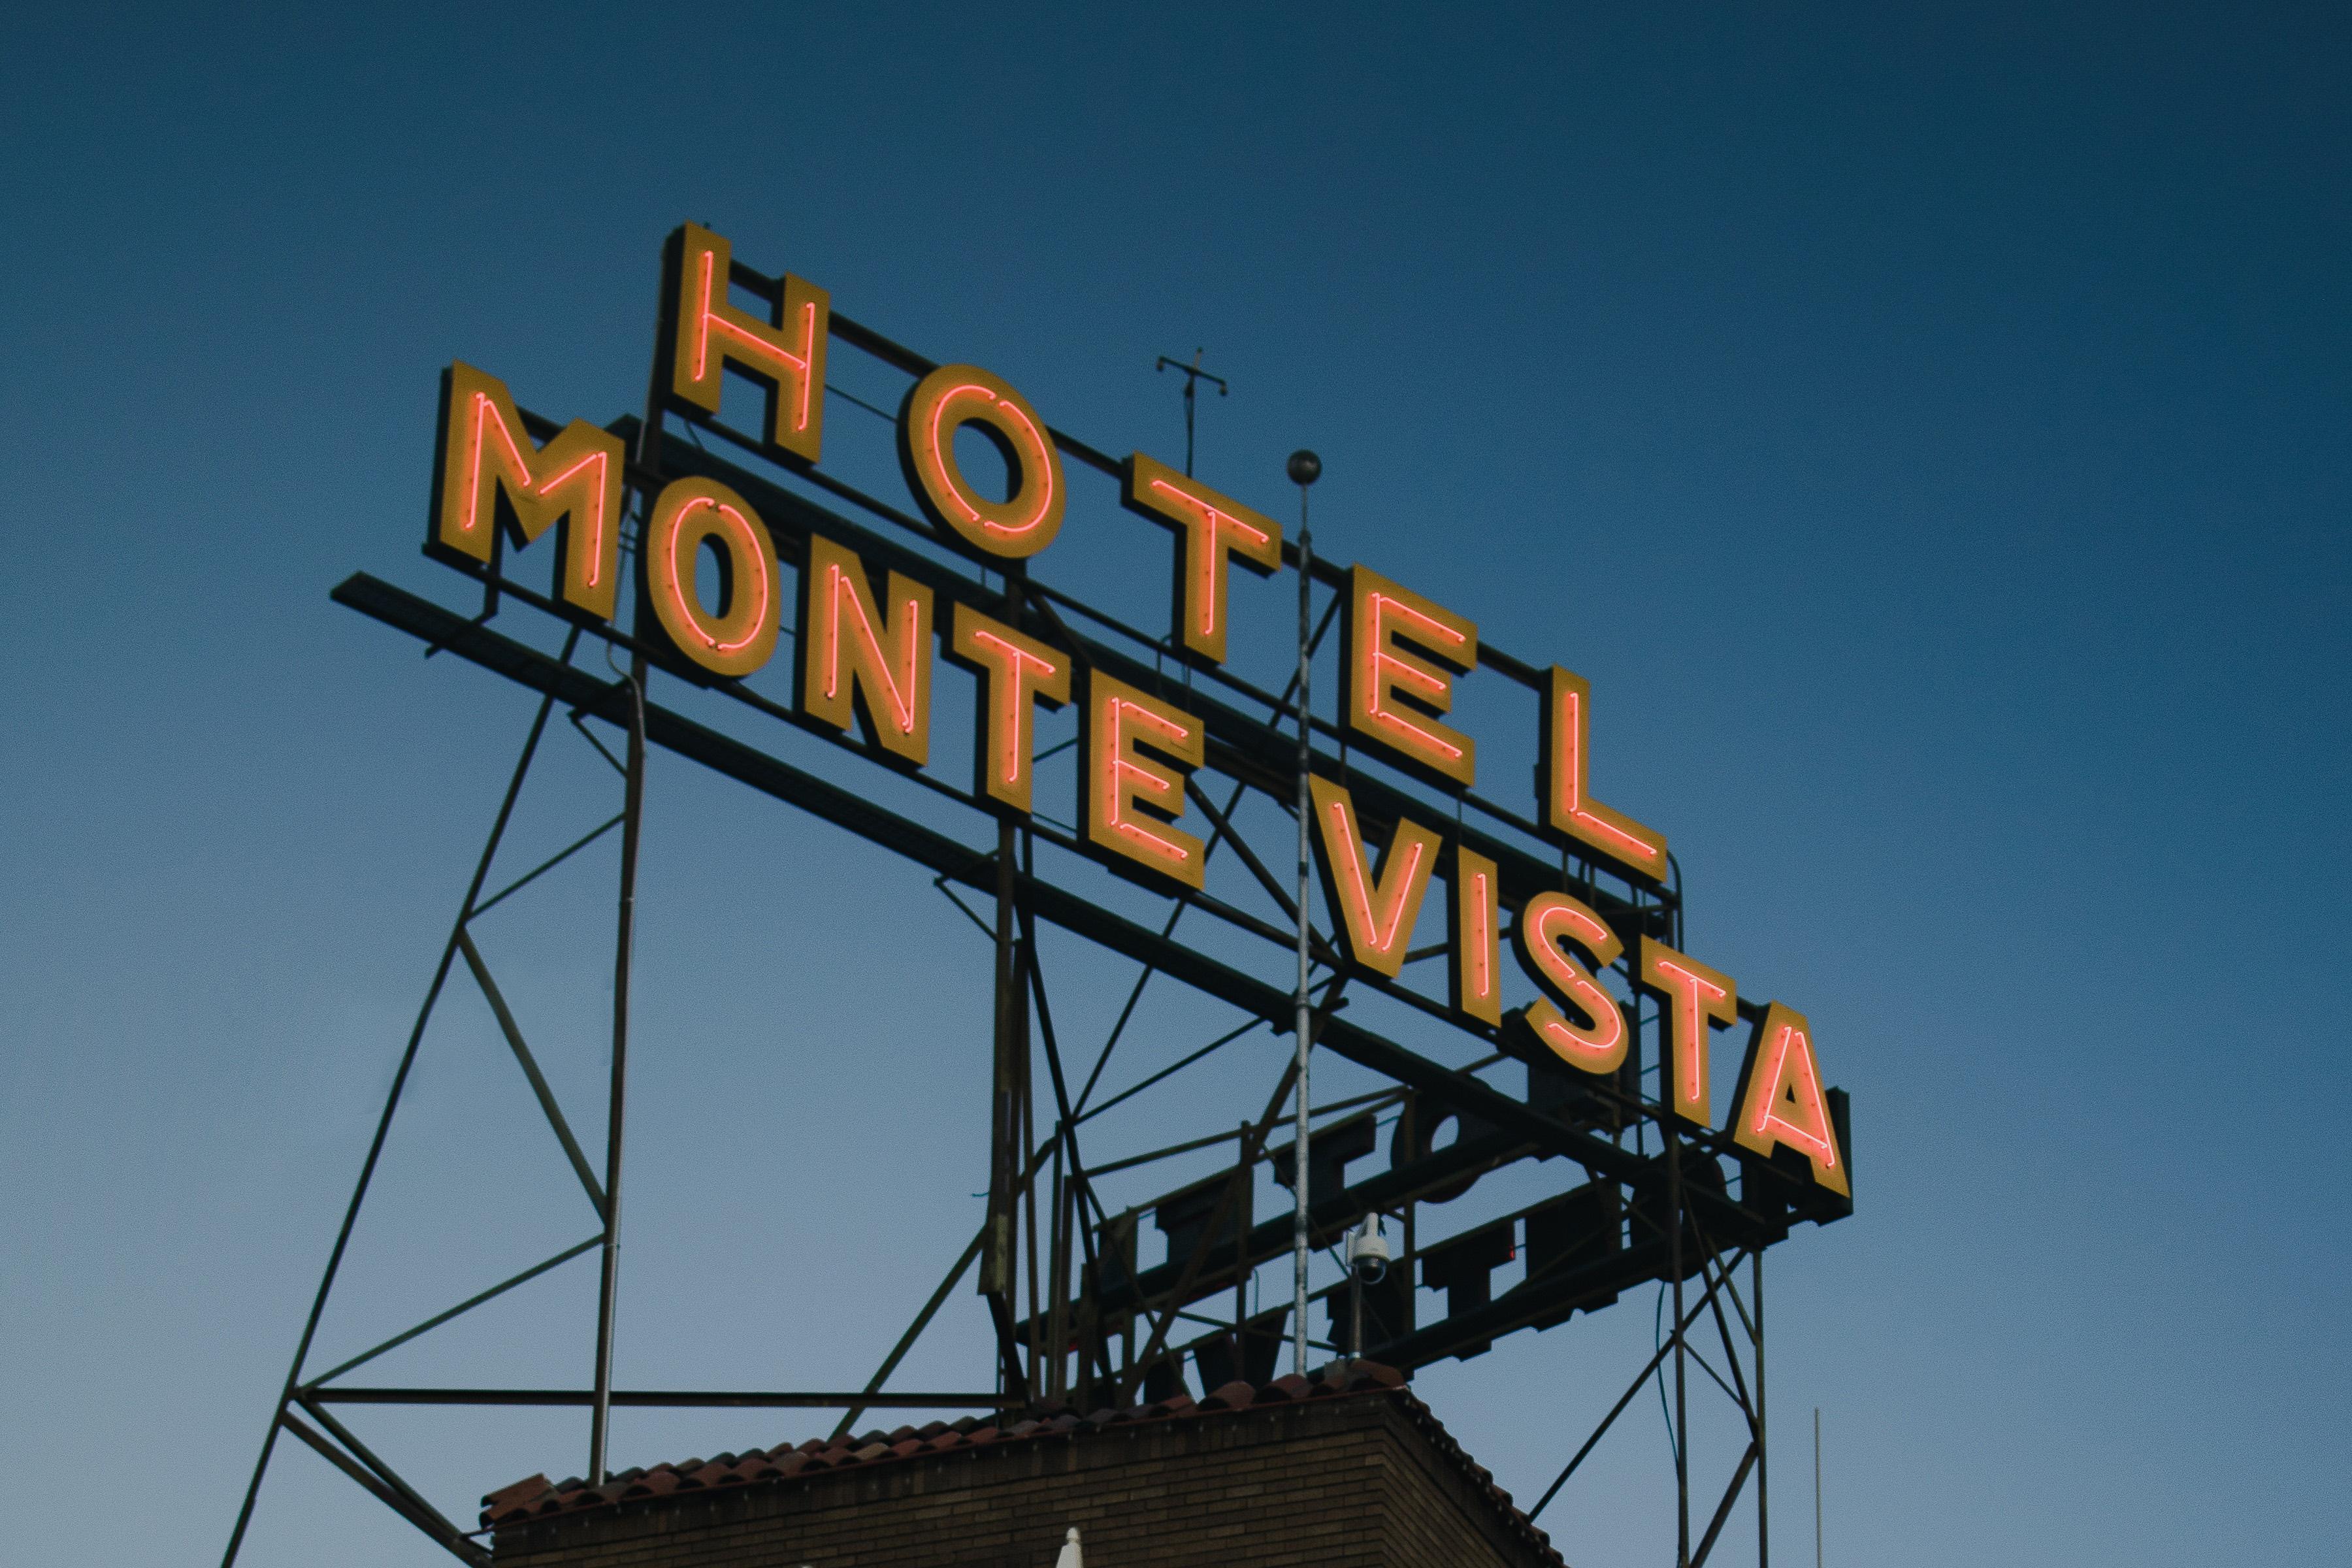 montevista_mood_1_2